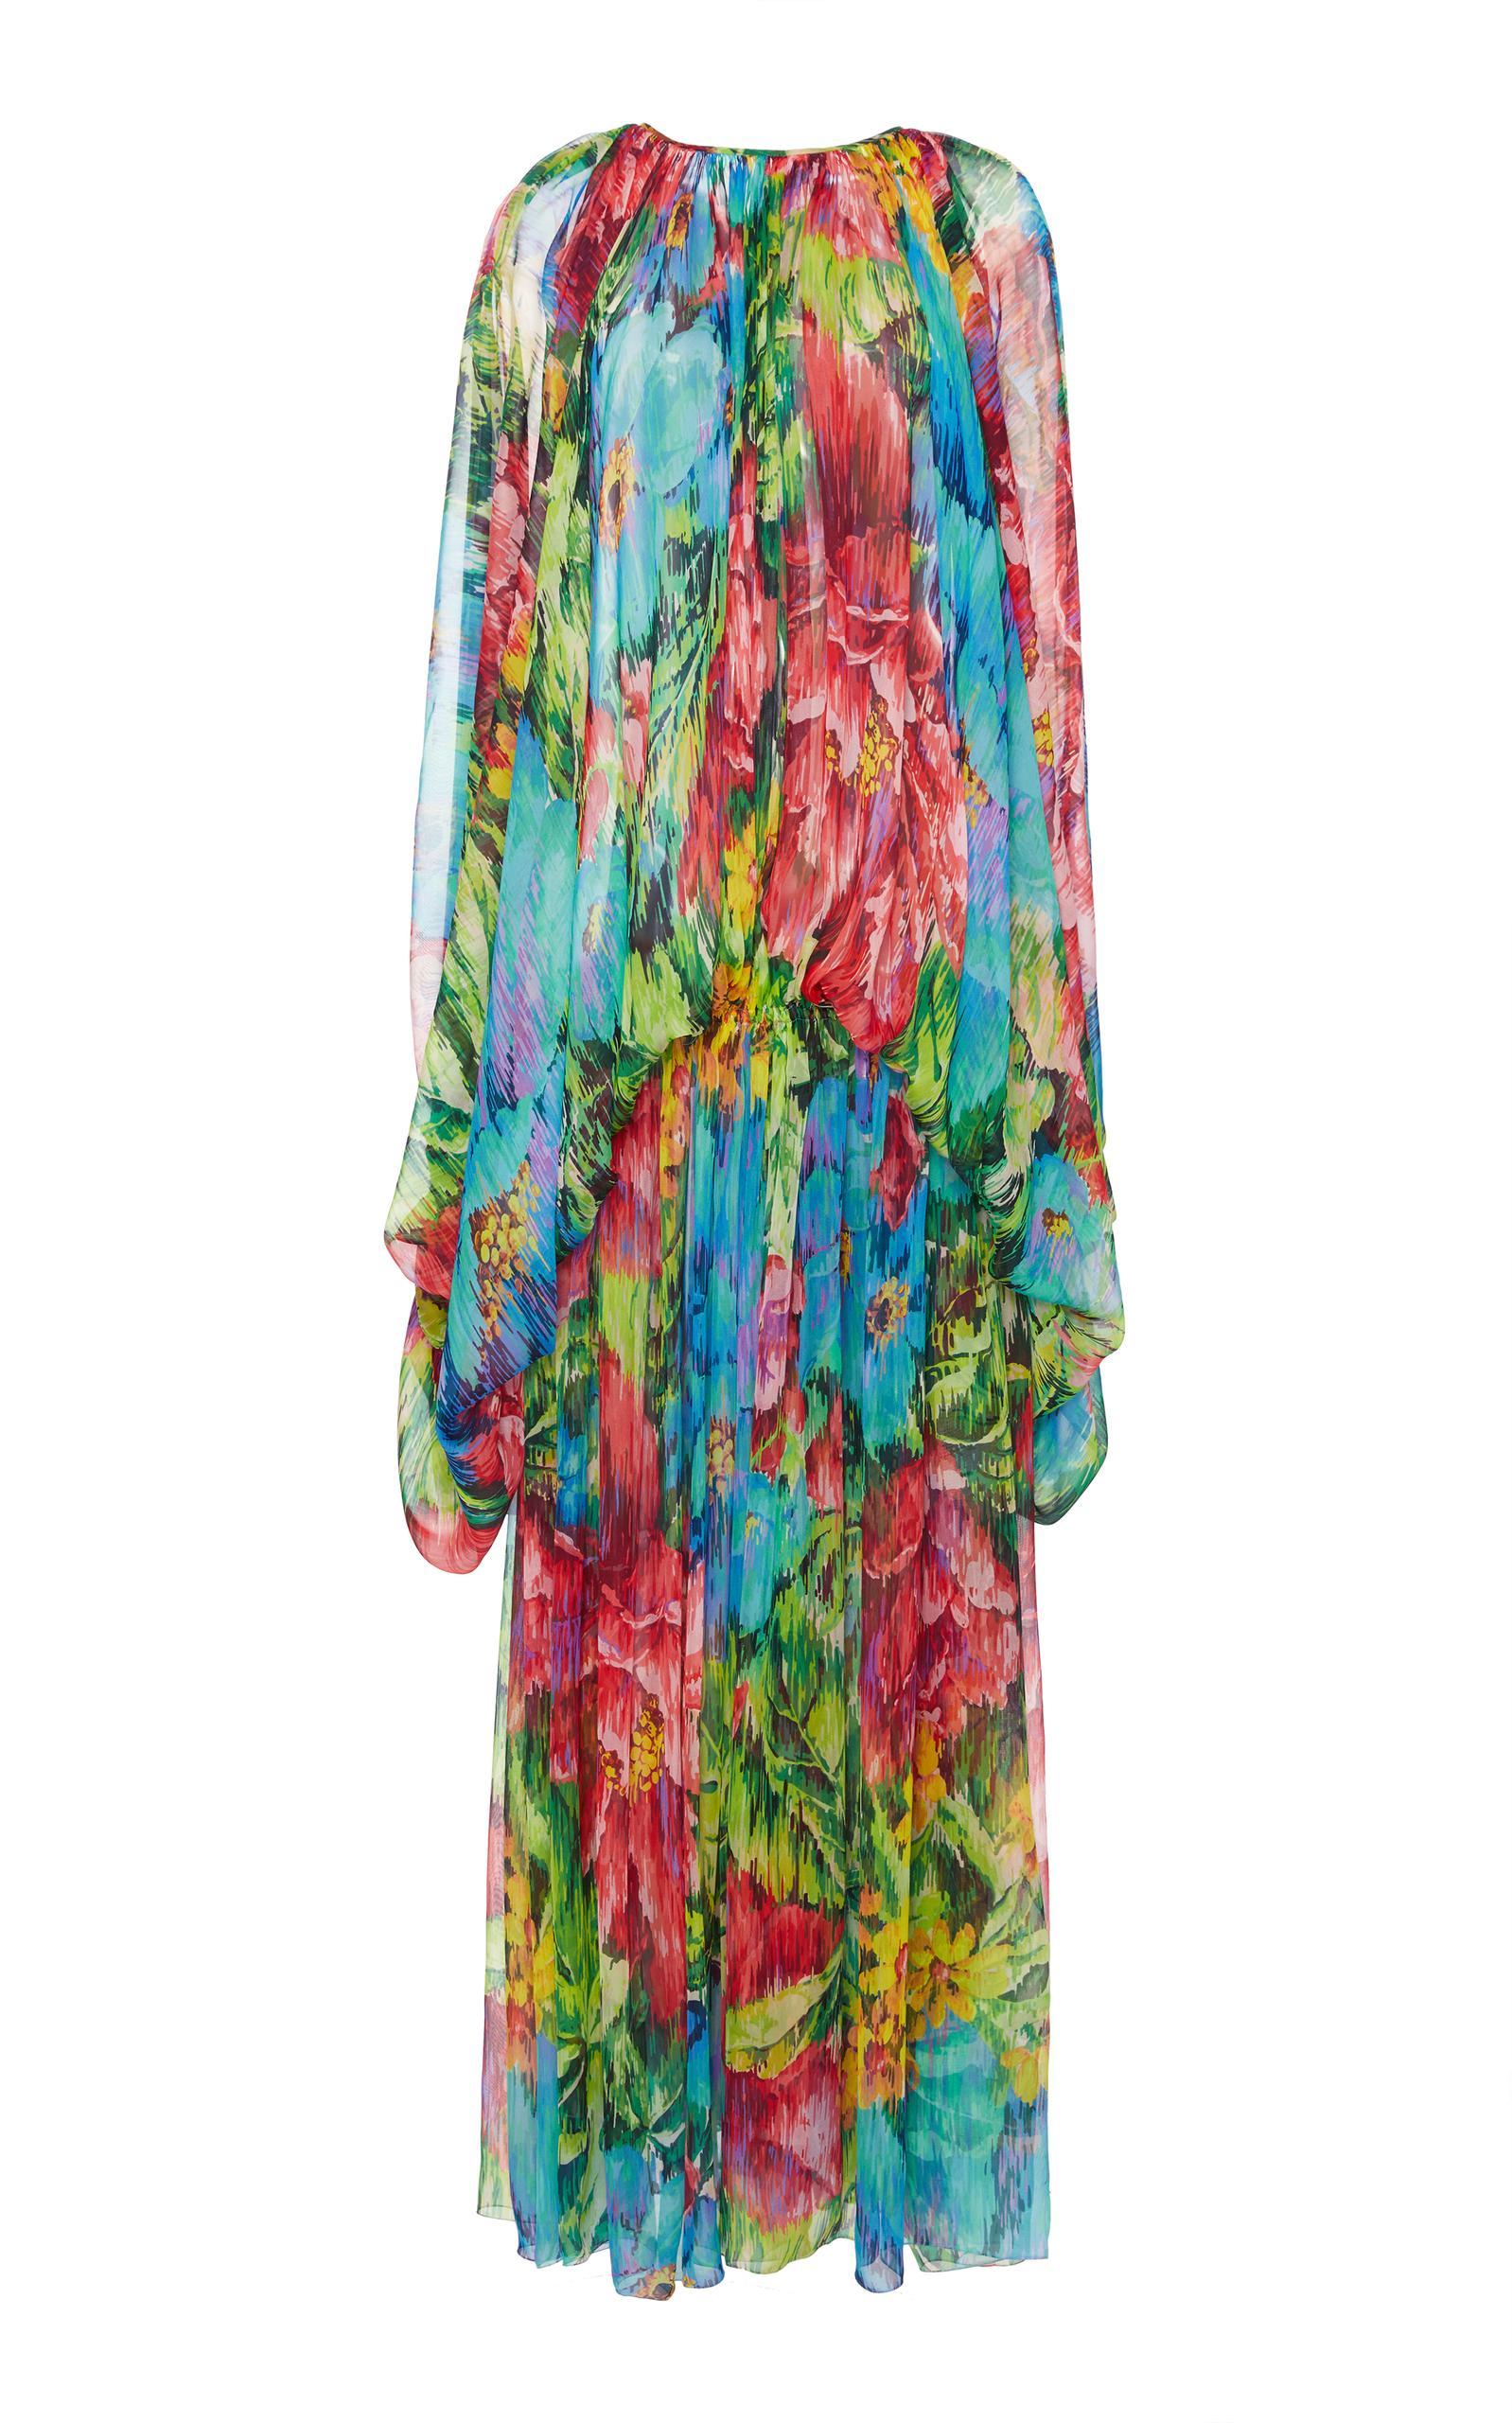 Dolce & Gabbana Floral Maxi Dress